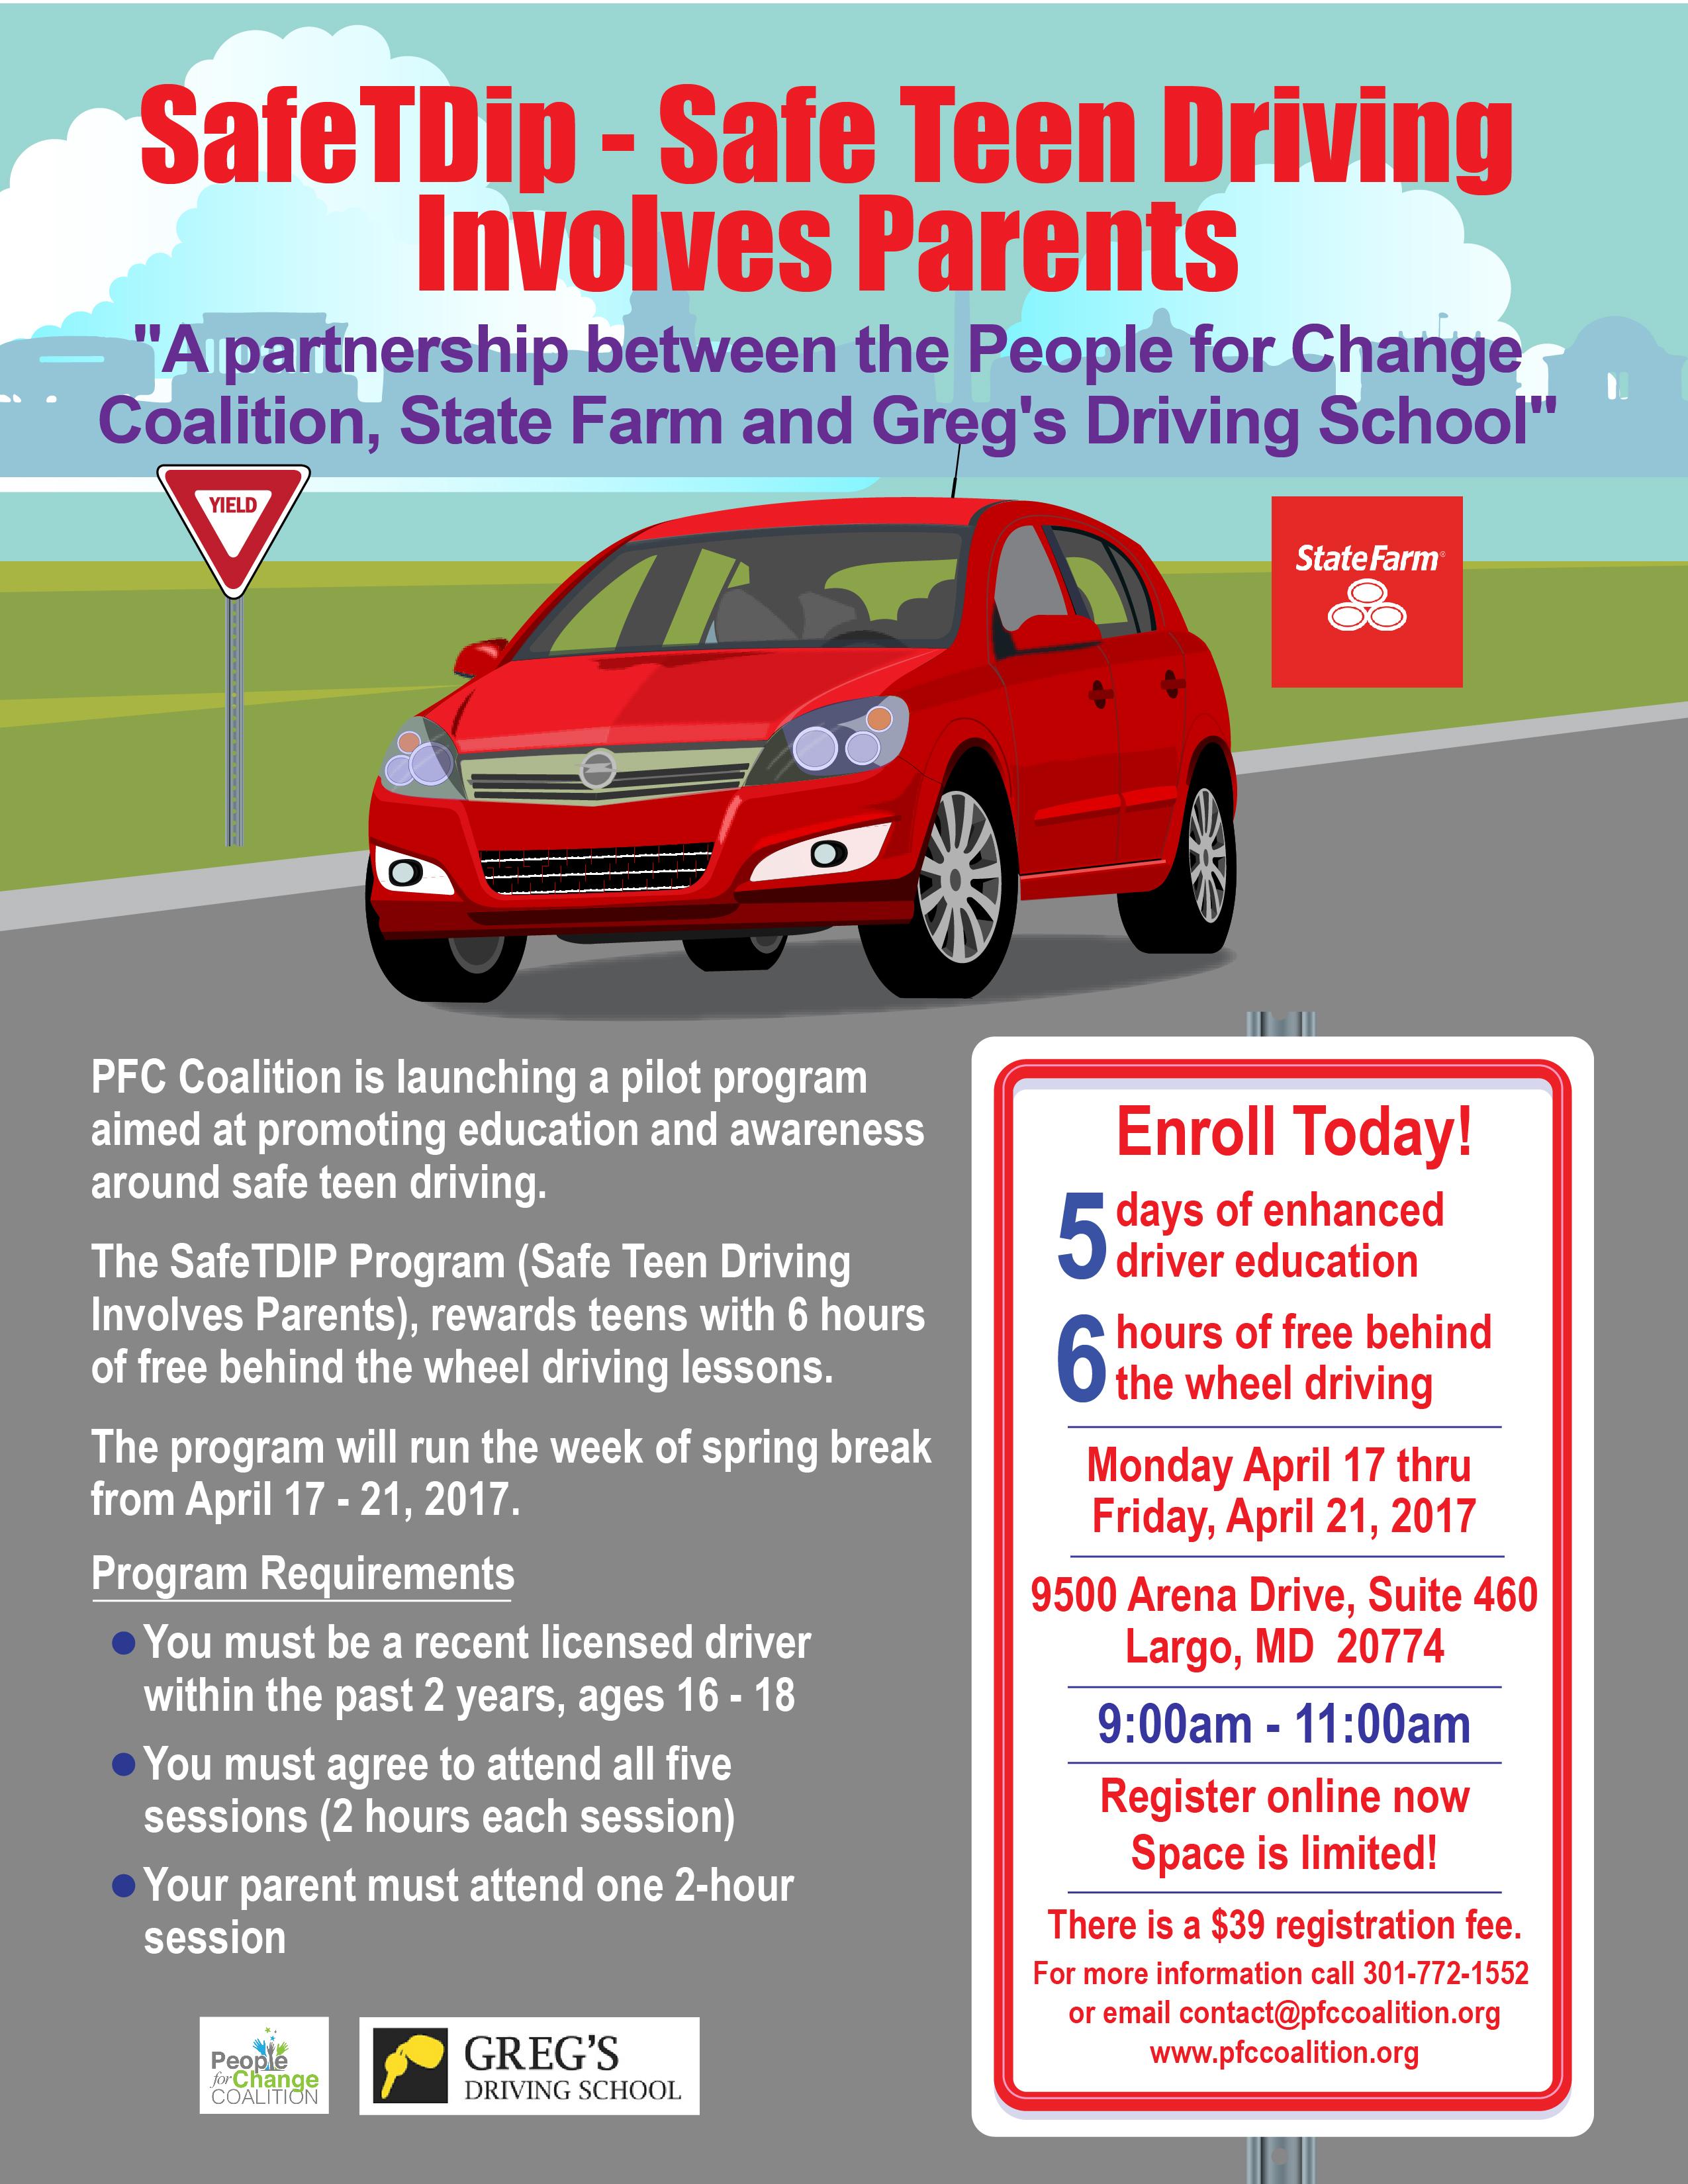 Safe Teen Driving Program During 14